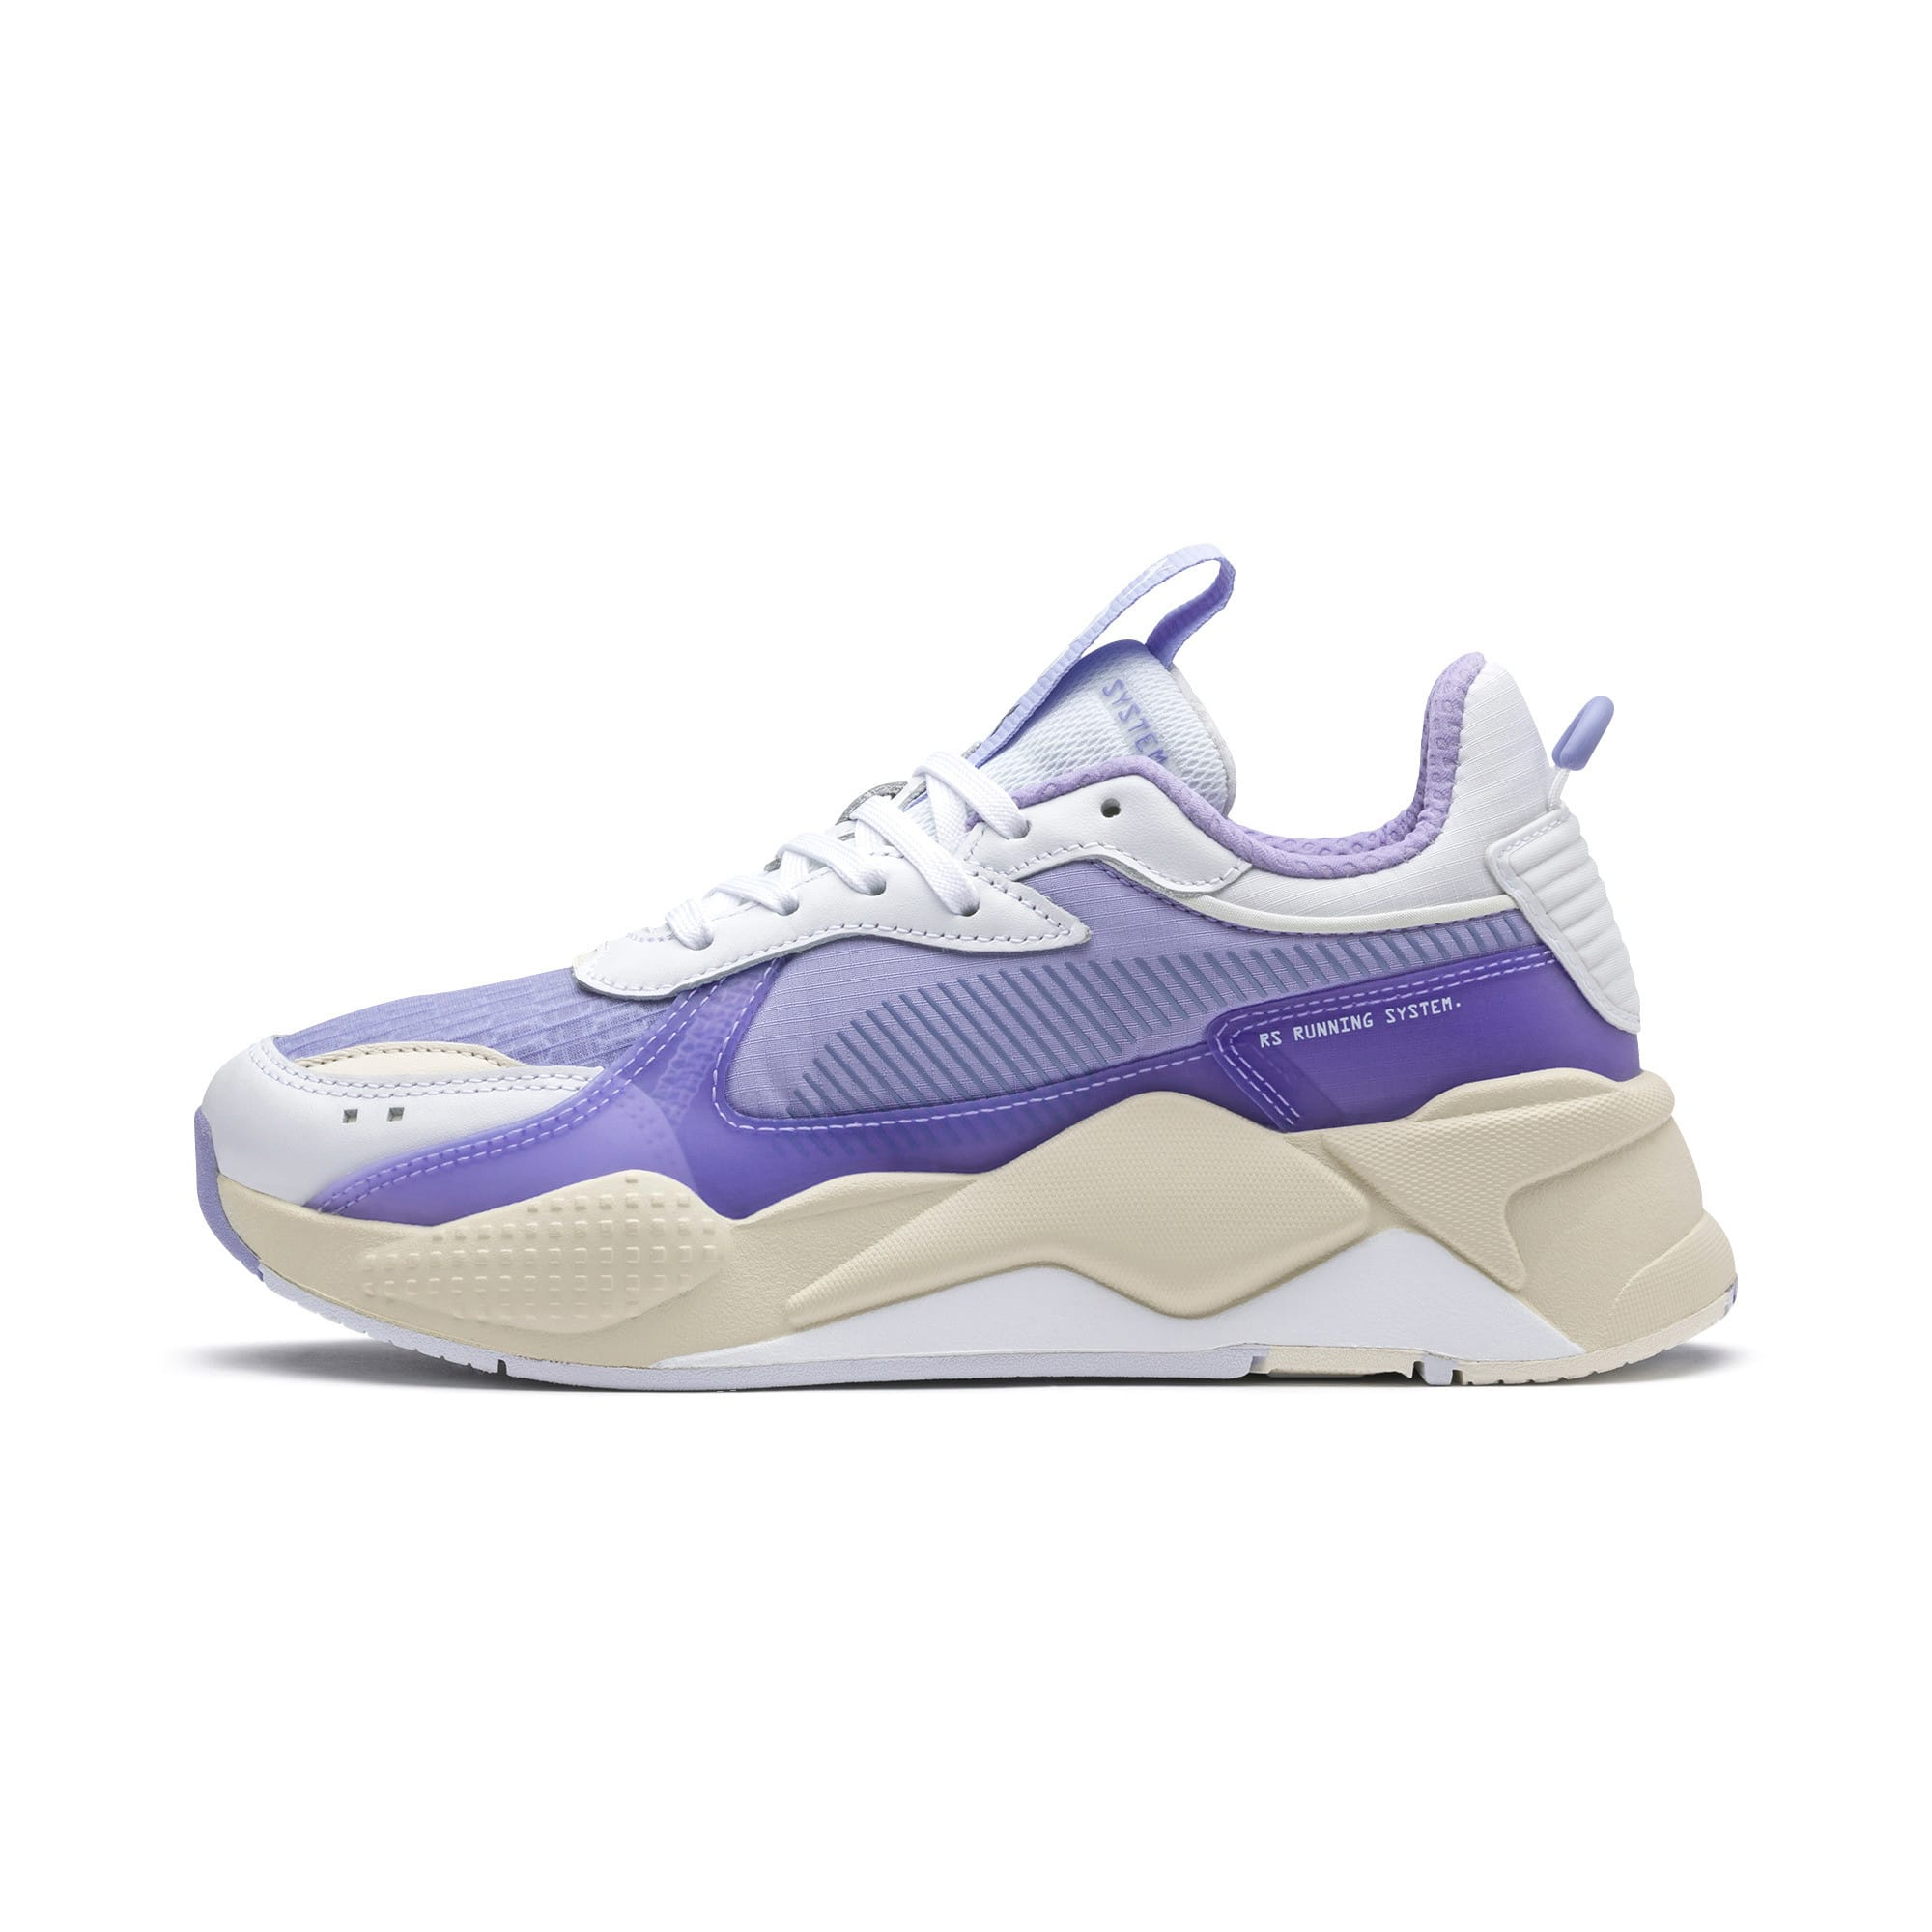 Thumbnail 1 of RS-X Tech Sneaker, Puma White-Sweet Lavender, medium